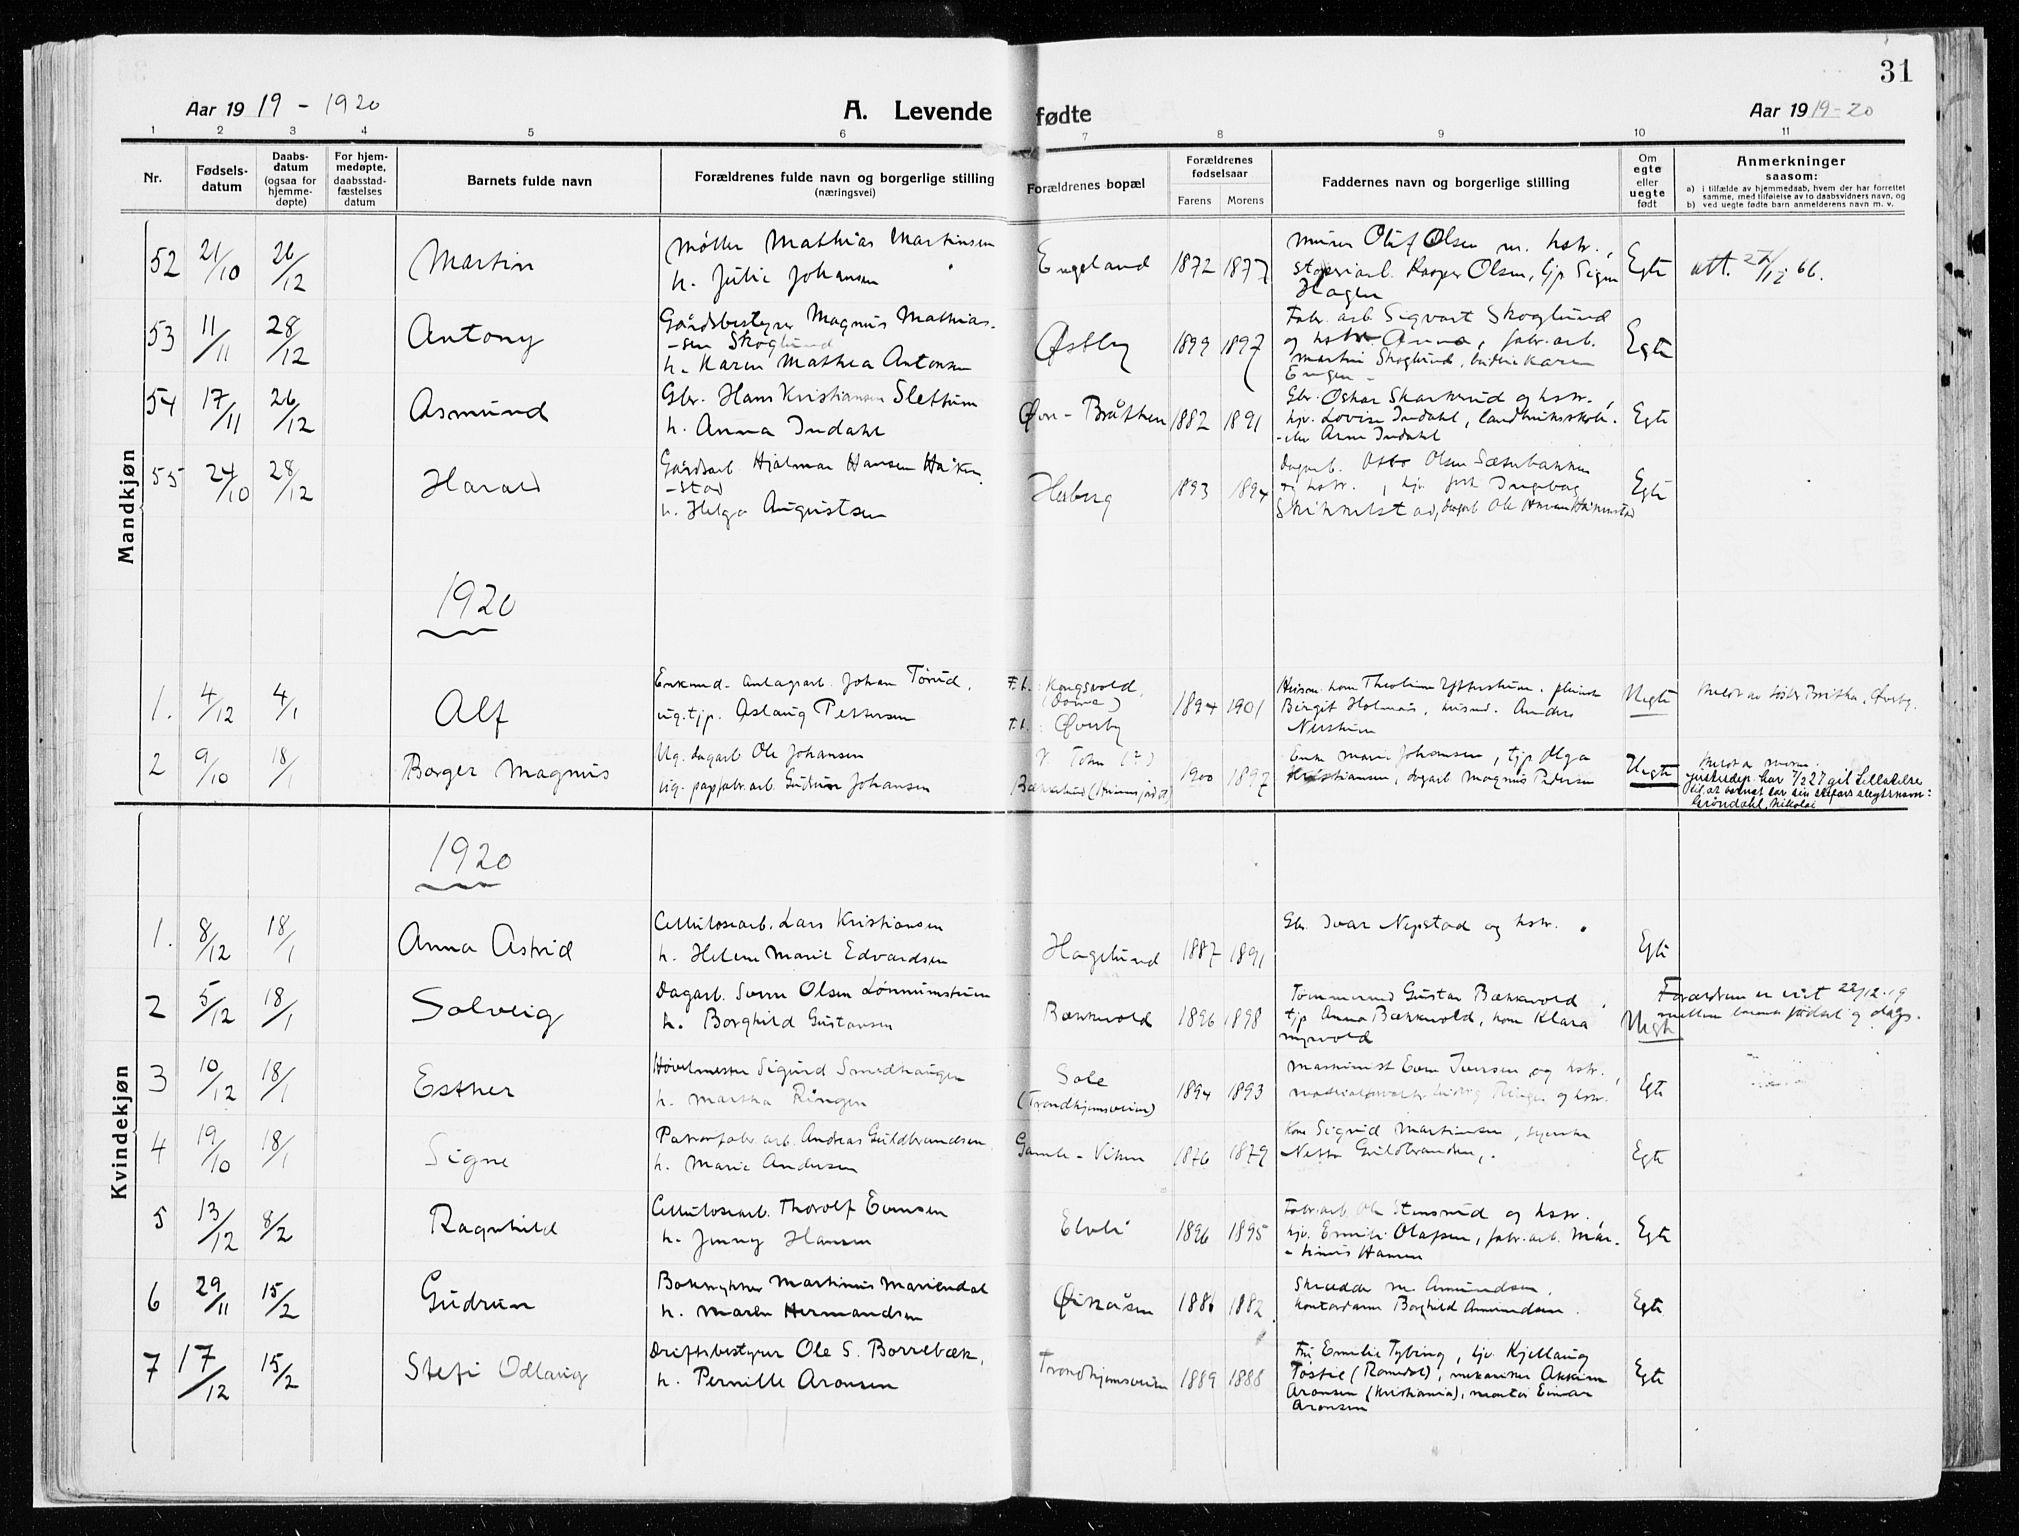 SAH, Vardal prestekontor, H/Ha/Haa/L0017: Ministerialbok nr. 17, 1915-1929, s. 31